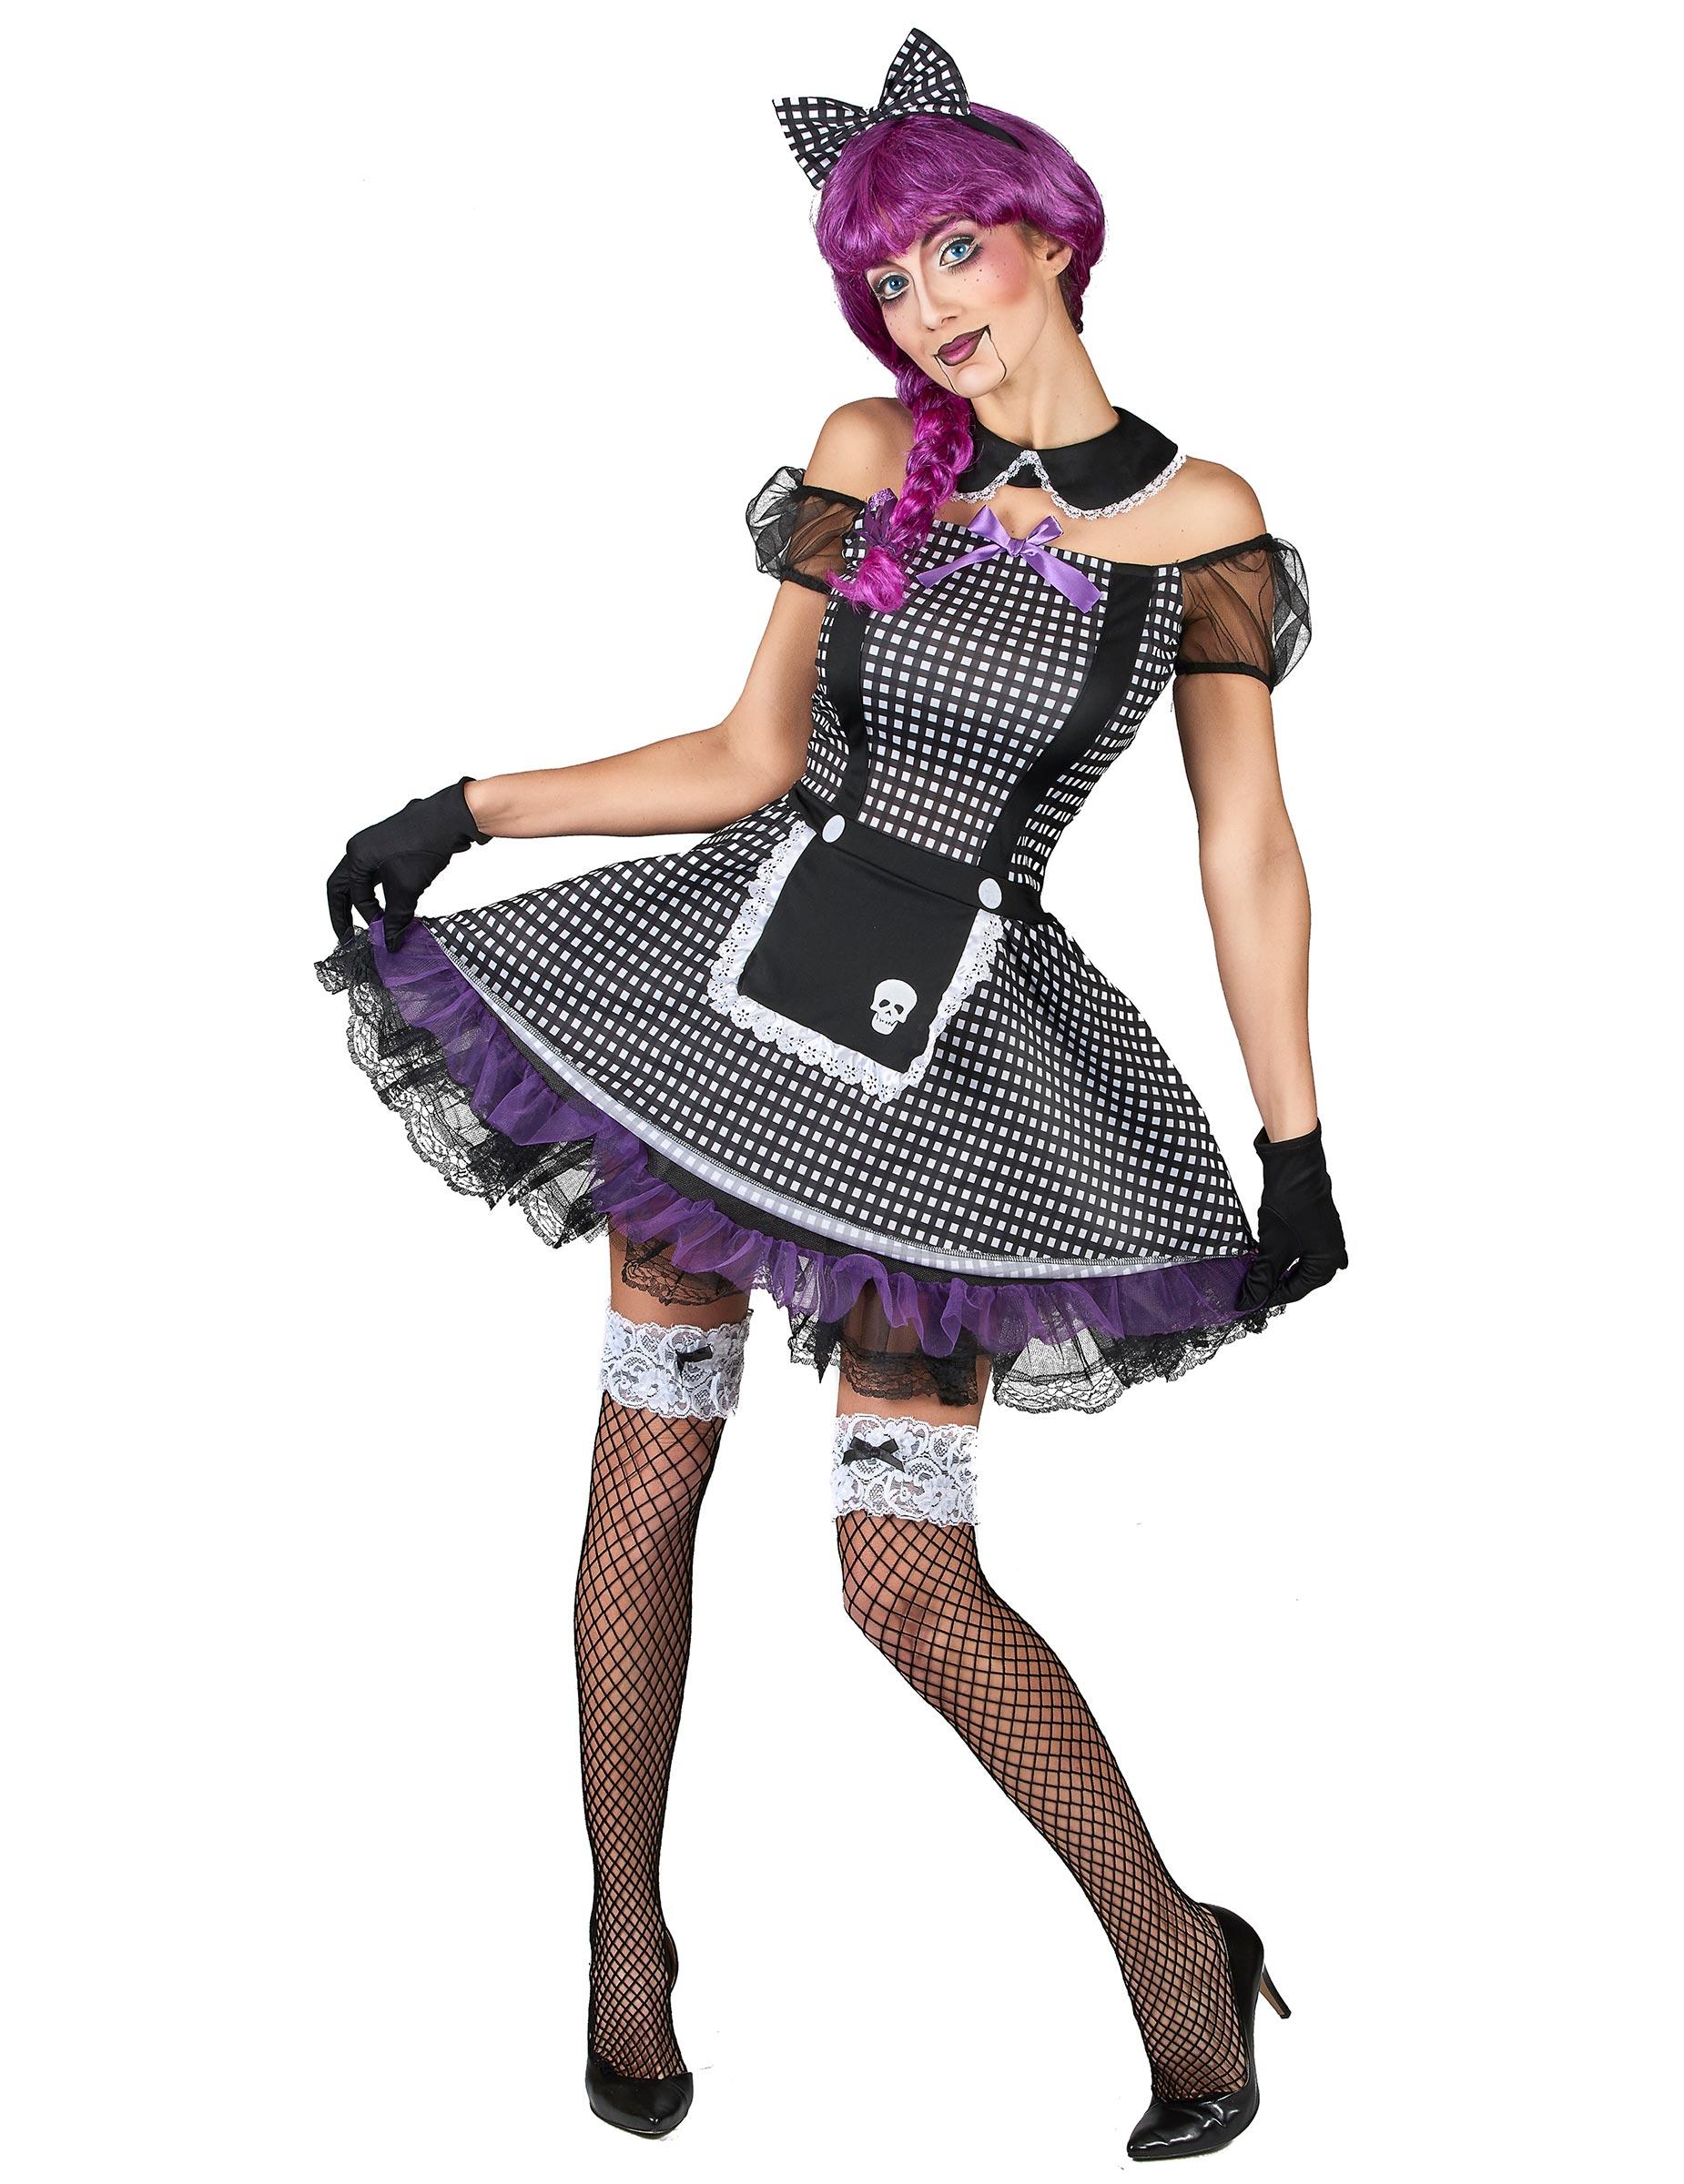 c5afade747 Disfarce boneca gótica mulher: Disfarces Adultos,mascarilhas e fatos ...